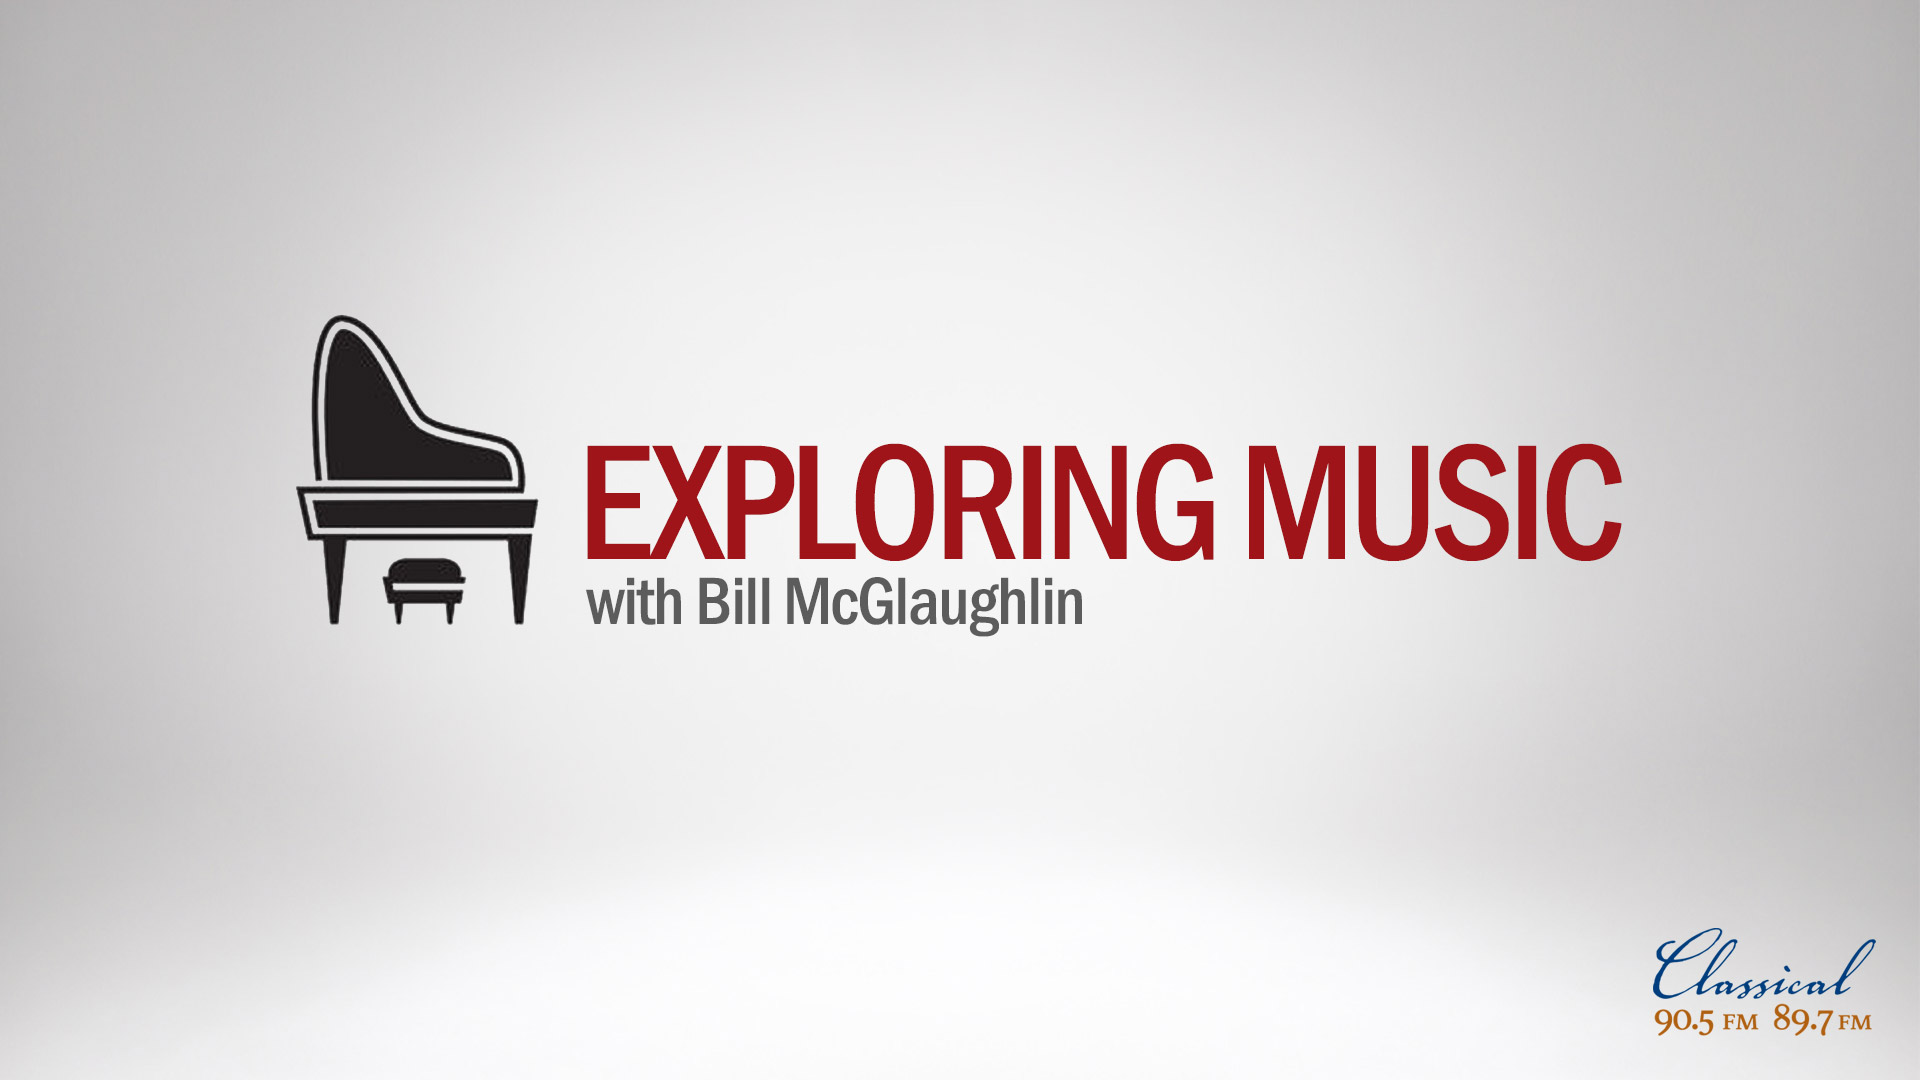 Exploring Music with Bill McGlaughlin